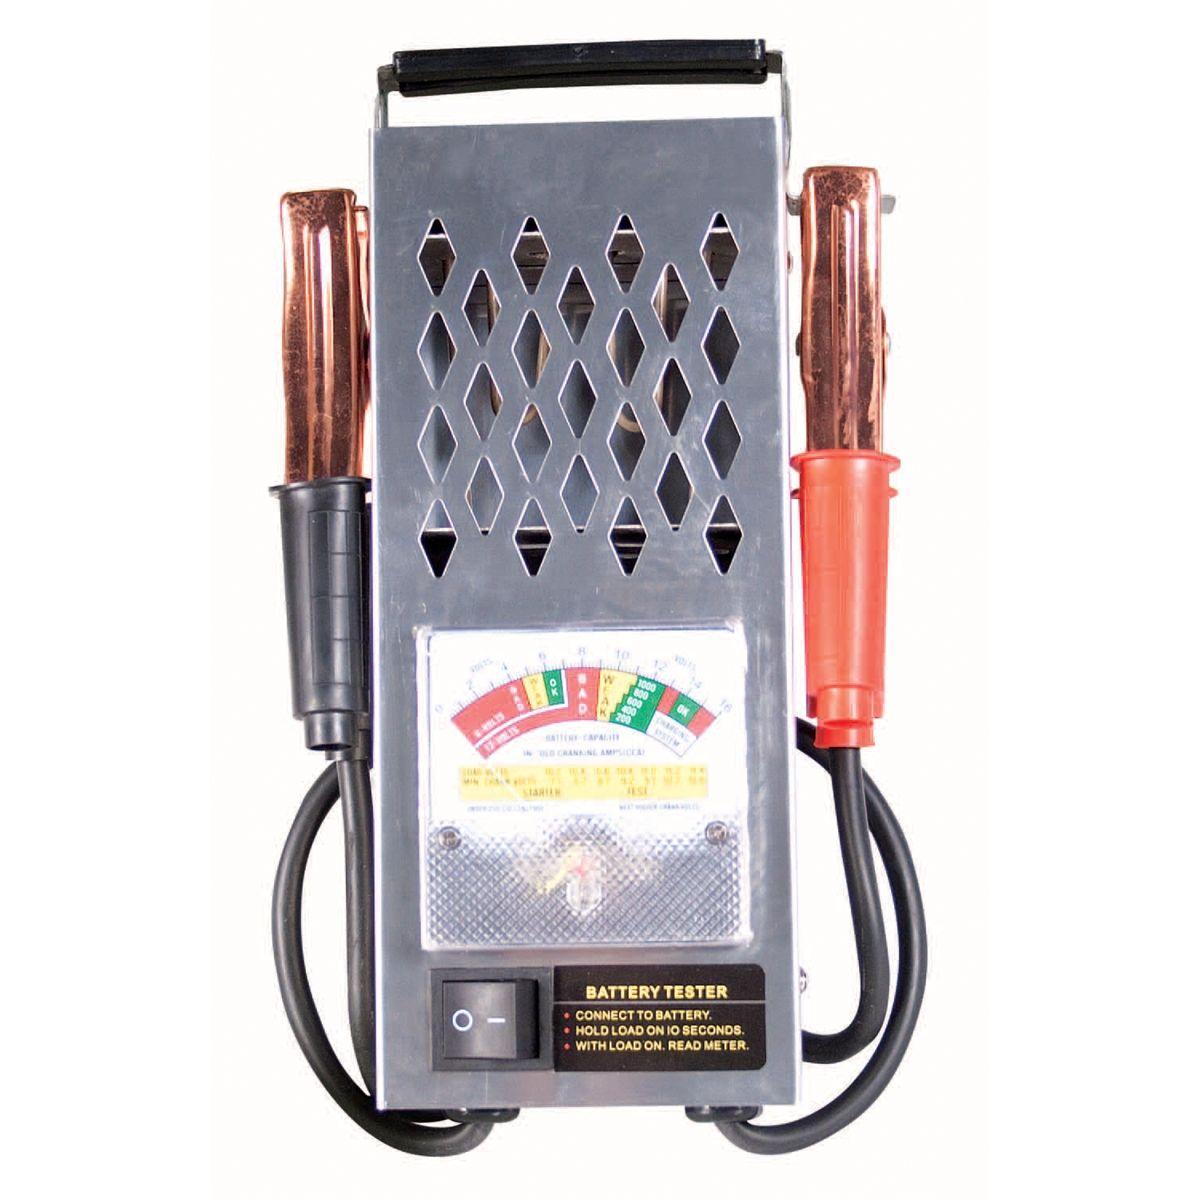 12 Volt Battery Tester Review : Fjc battery tester amp